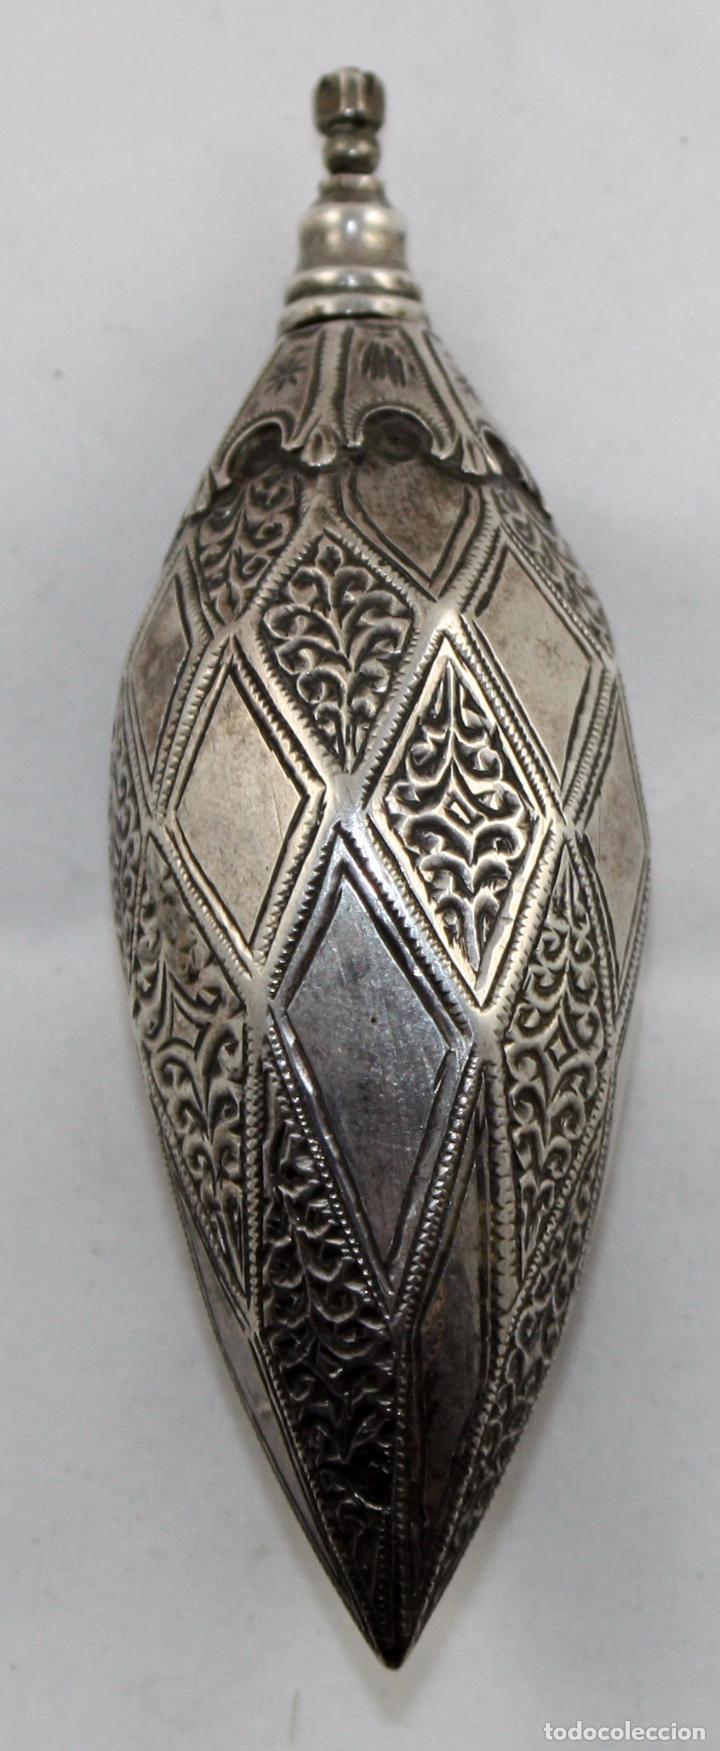 Antigüedades: PERFUMERO ORIENTALISTA EN PLATA DEL SIGLO XIX - Foto 4 - 100898631